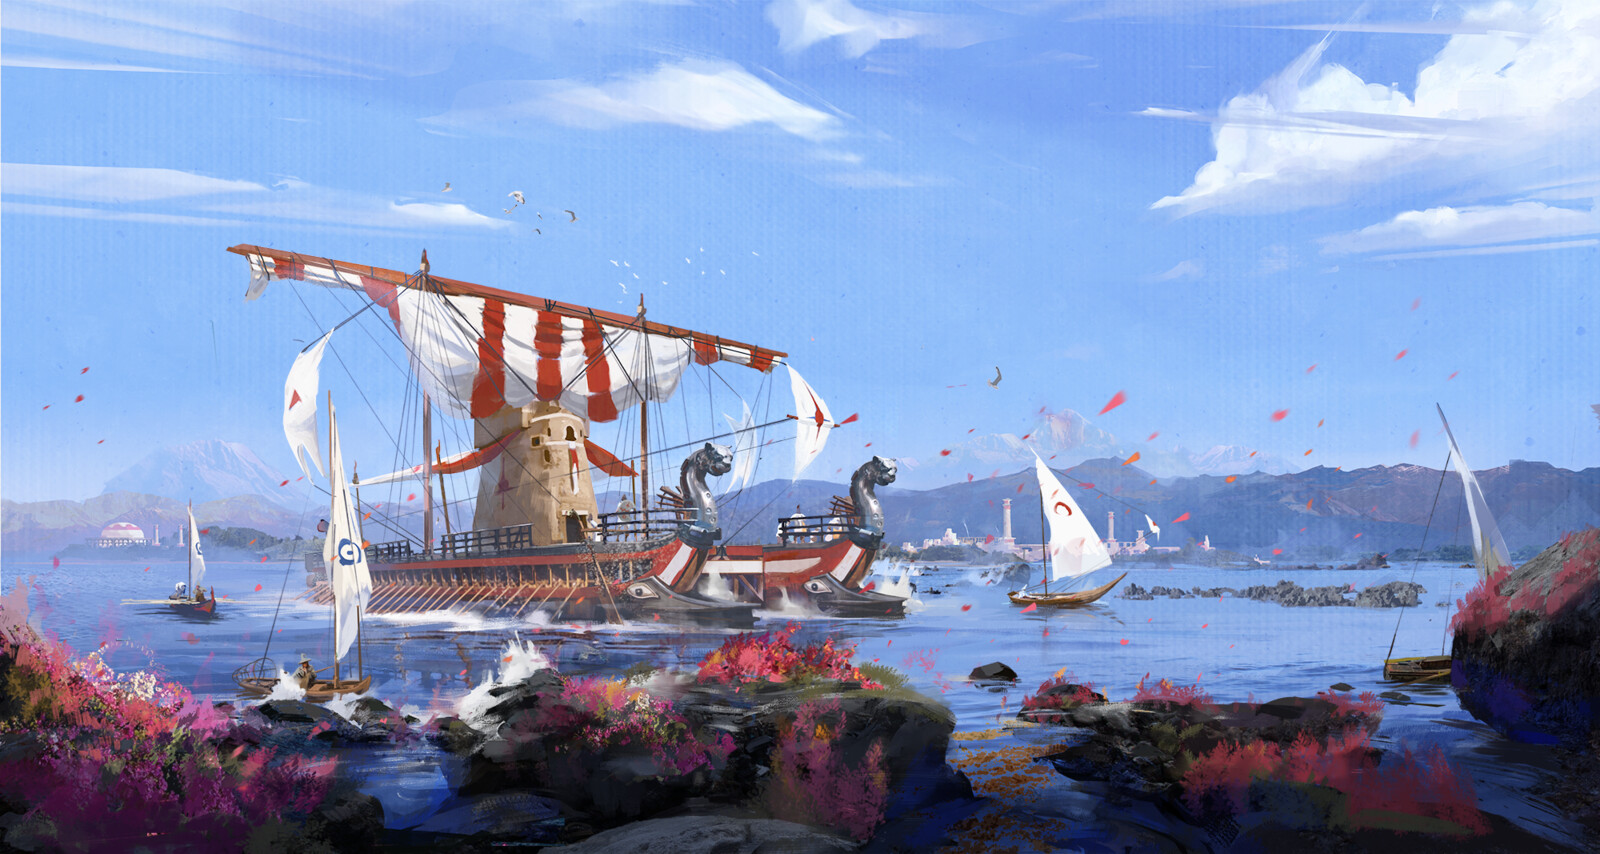 The Passage of the 'Hermeta' through the Crimson Strait - Illustration and design work